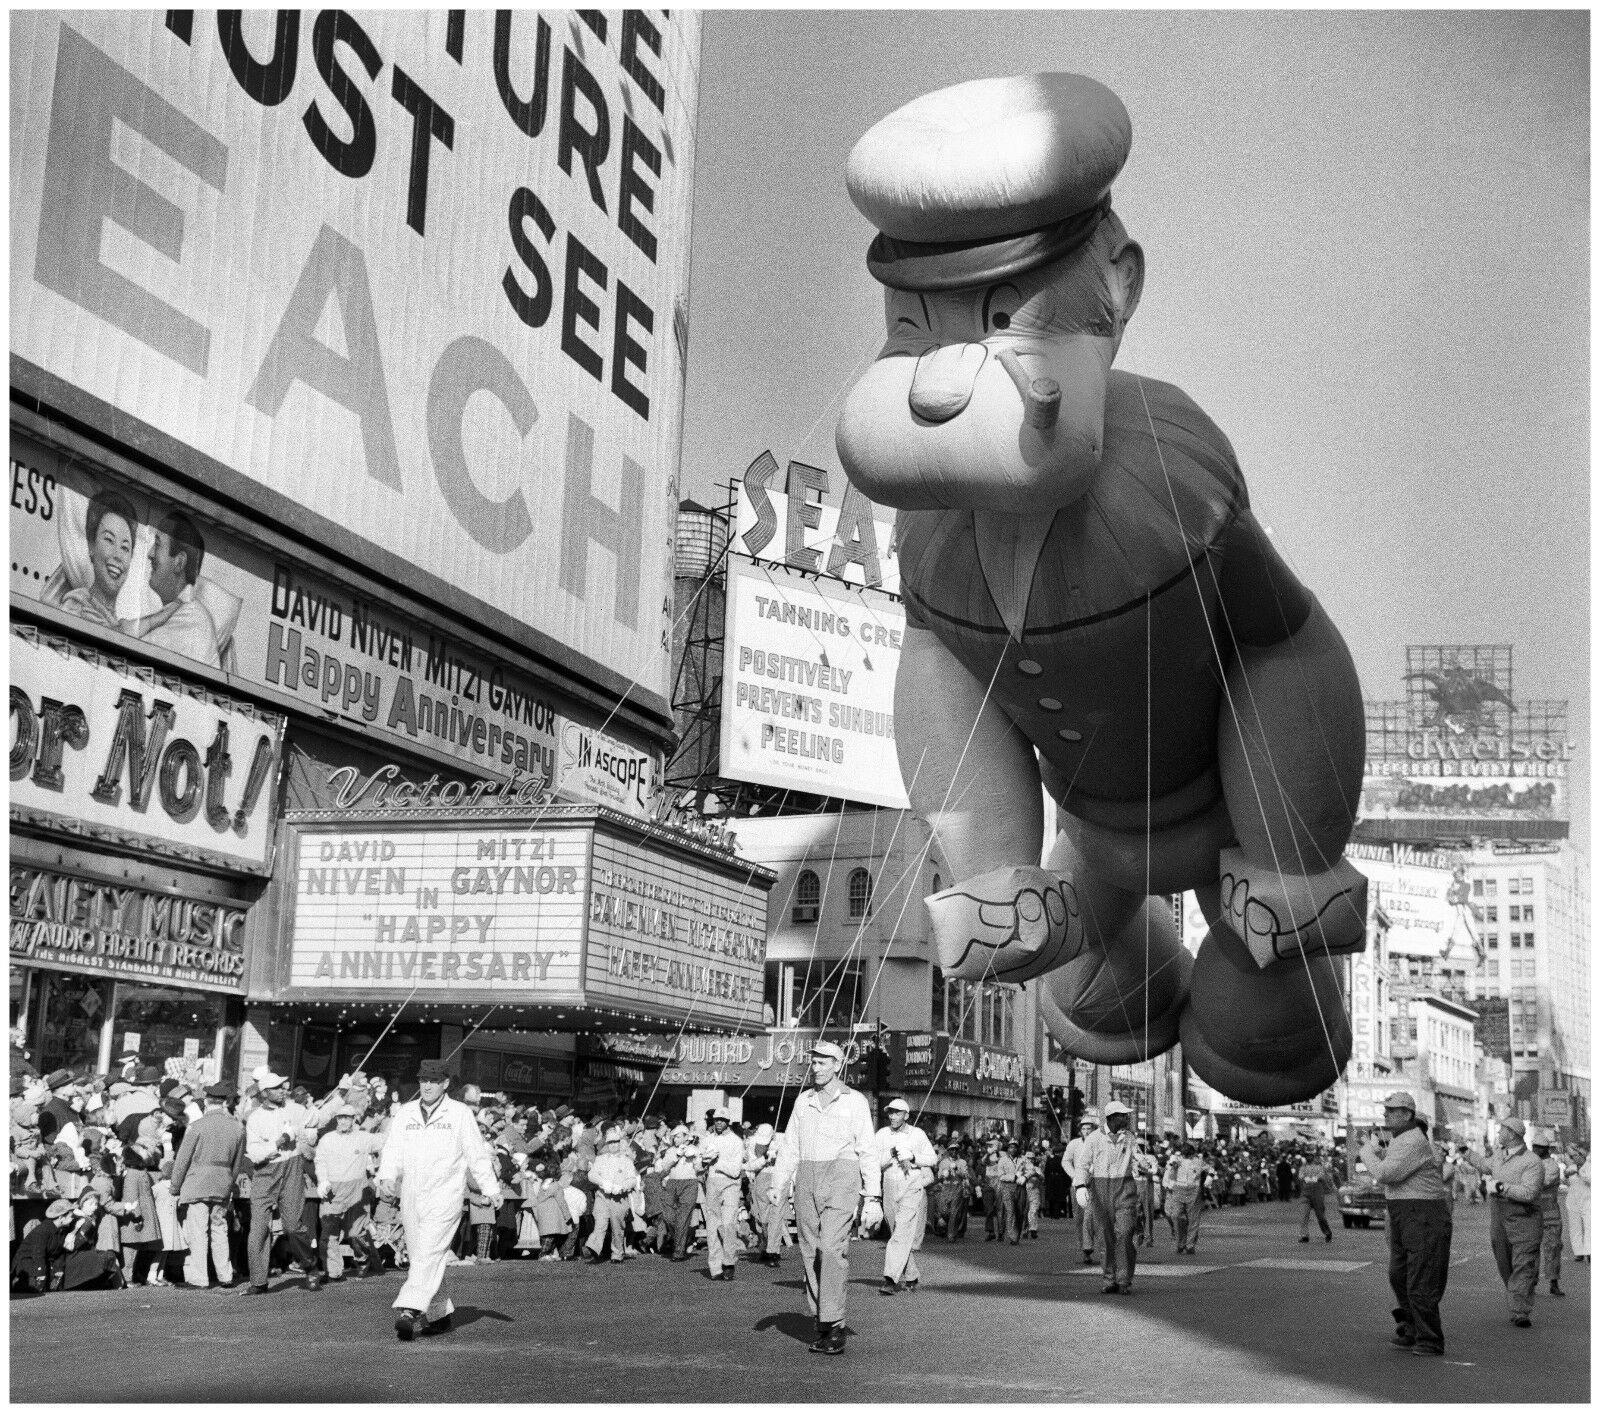 1959 Popeye Balloon At Macy S Thanksgiving Parade Thanksgiving Parade Macy S Thanksgiving Day Parade Macys Thanksgiving Parade